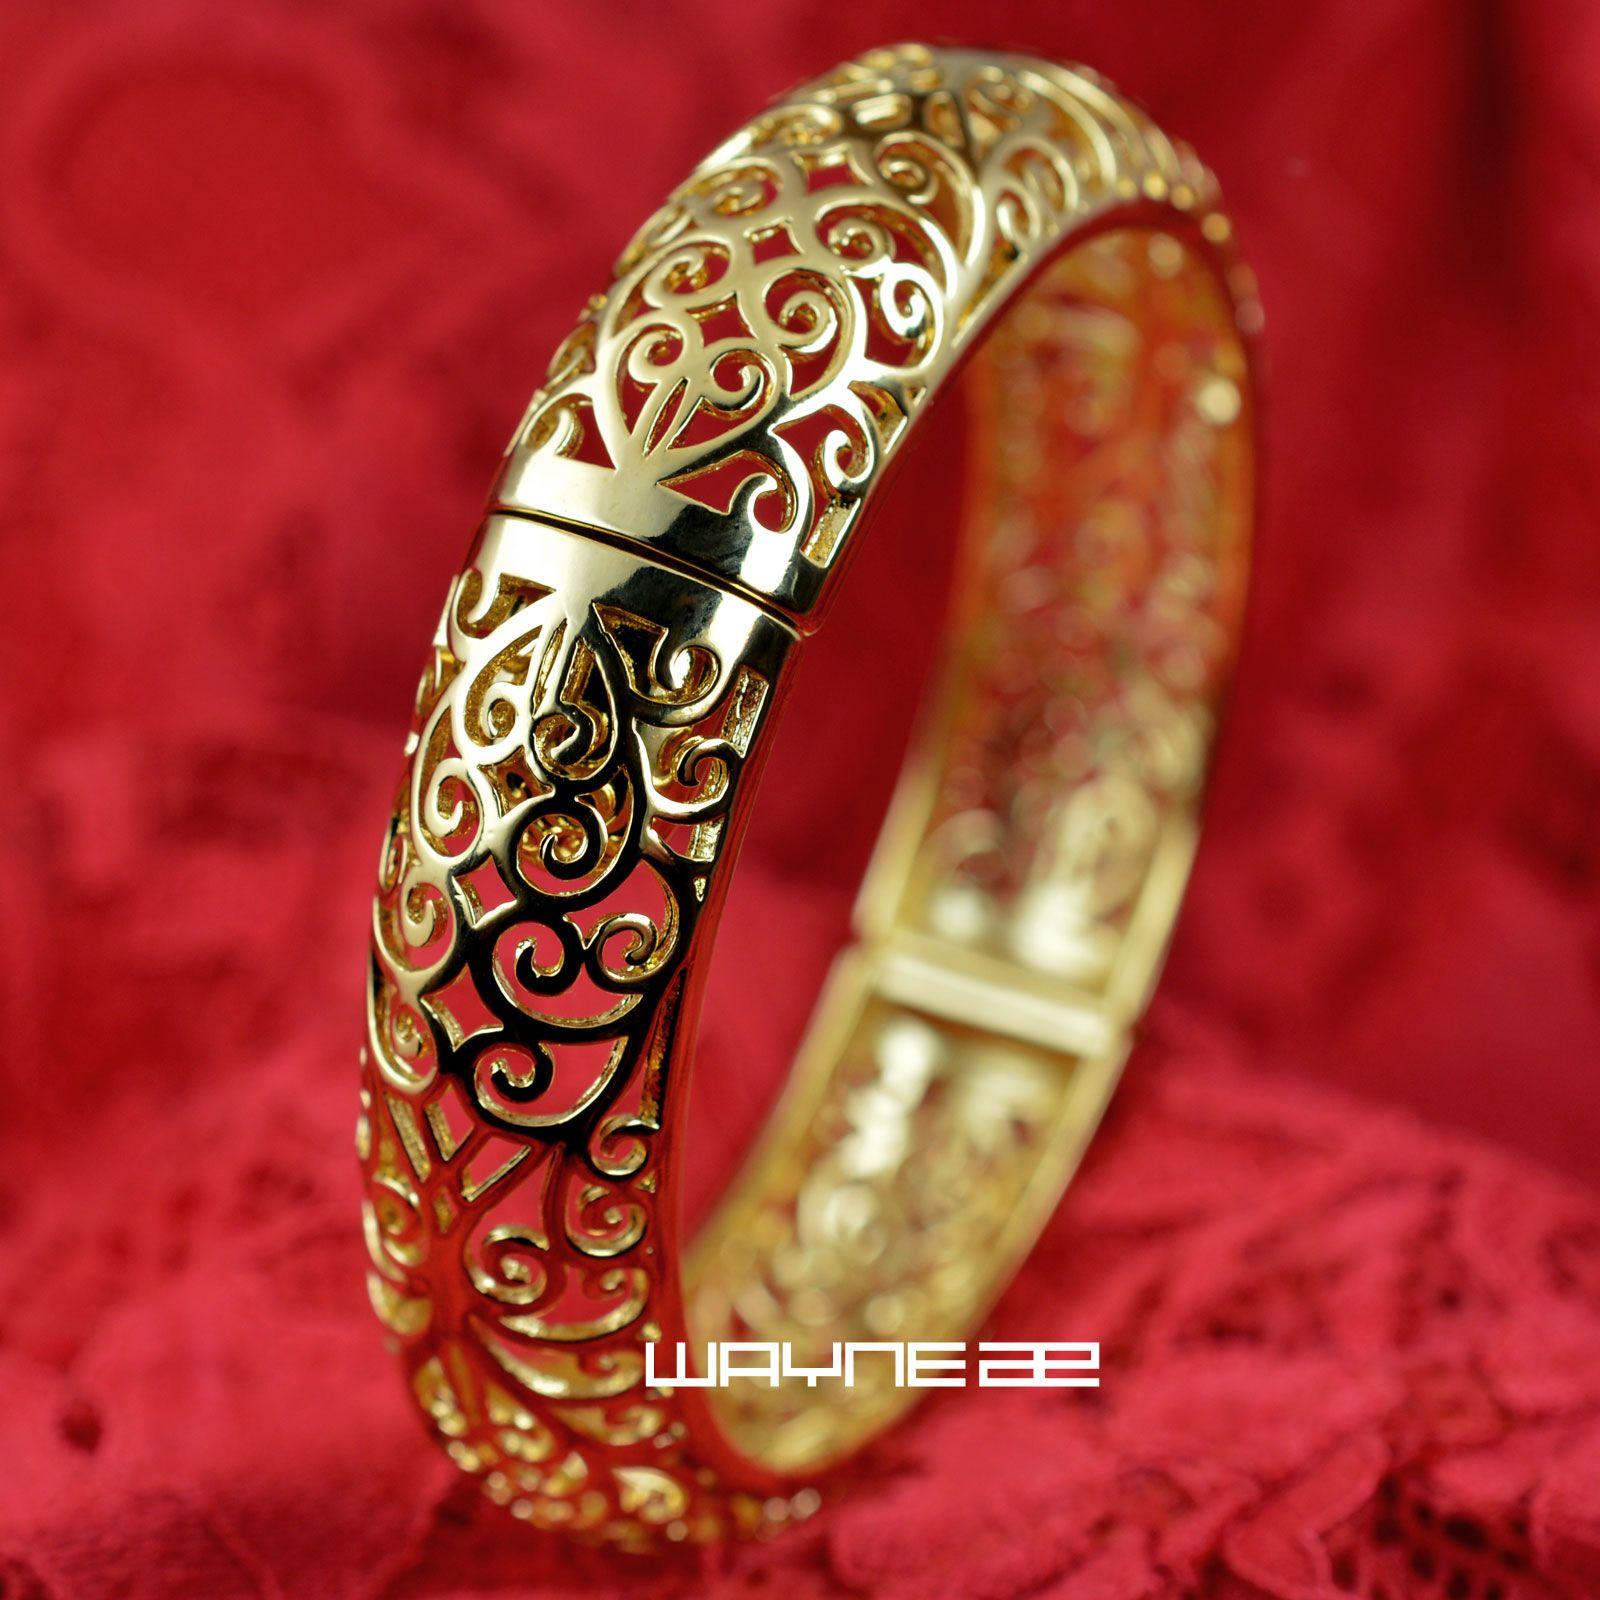 18k yellow Gold GF Vintage style diamond cut solid womens bangle Bracelet G97